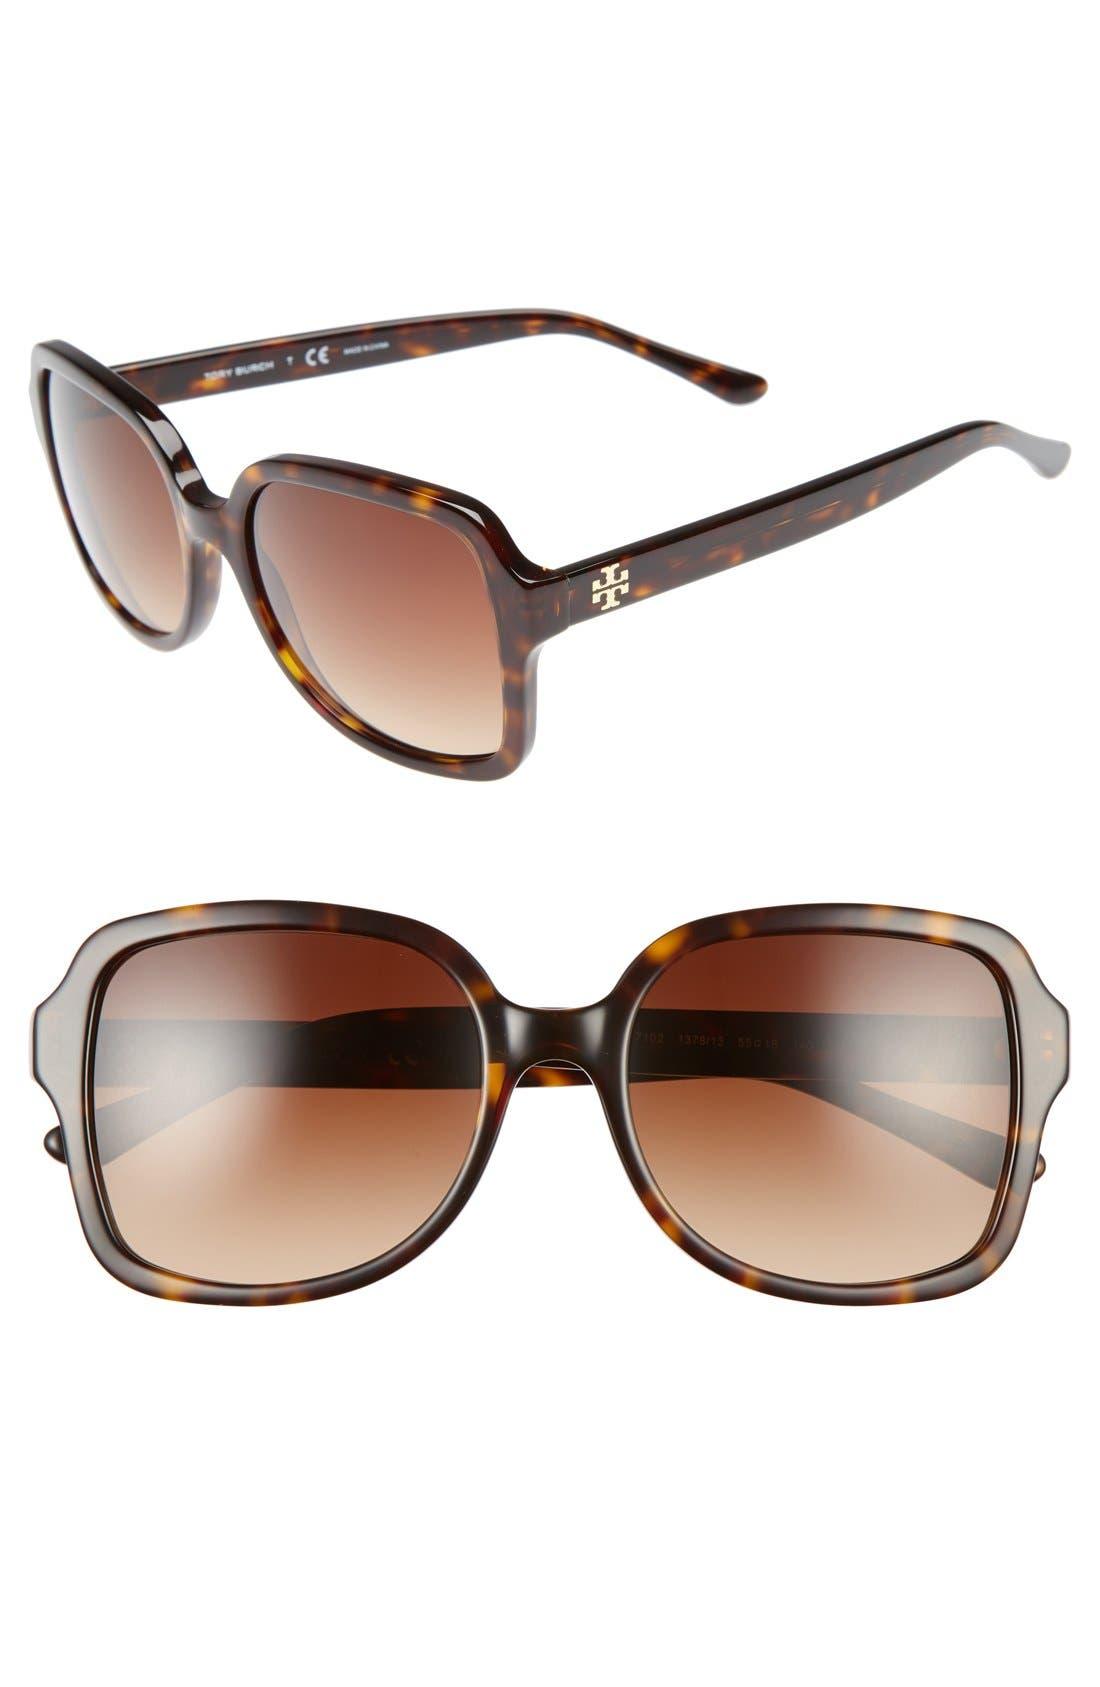 55mm Square Sunglasses,                         Main,                         color, Dark Tortoise